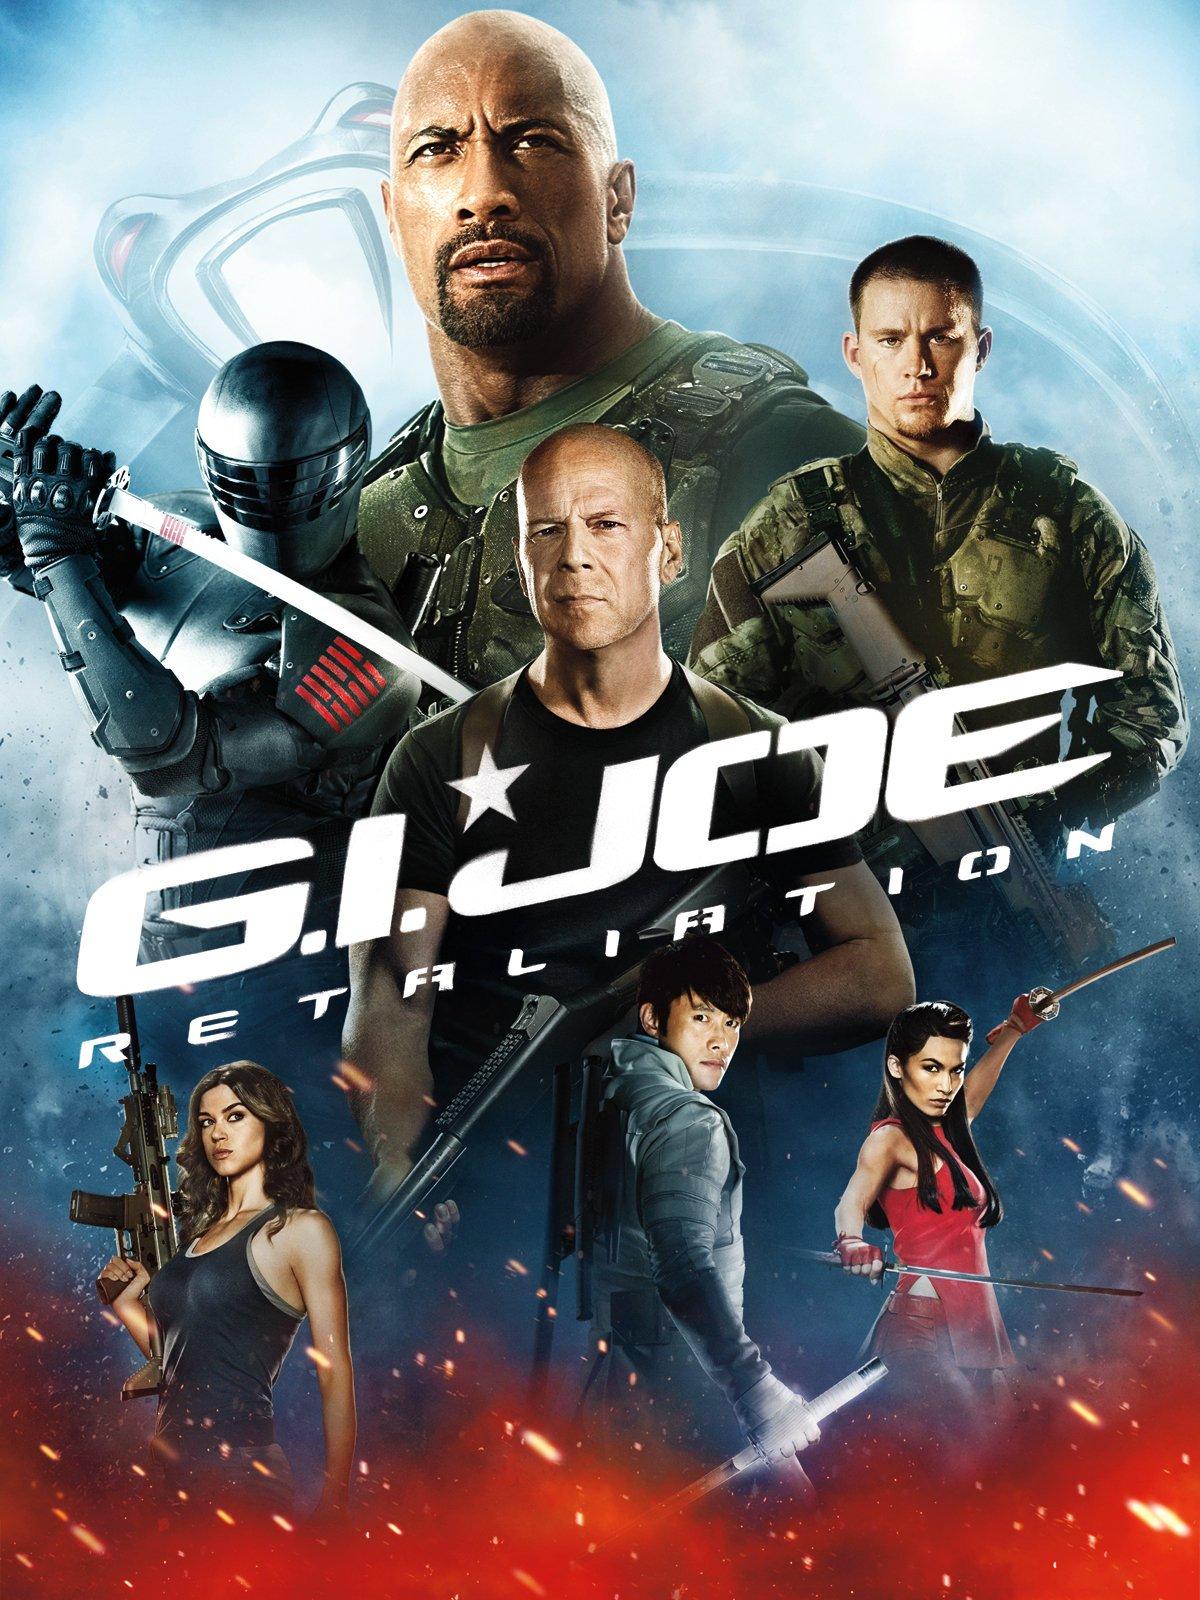 G.I. Joe: Retaliation by